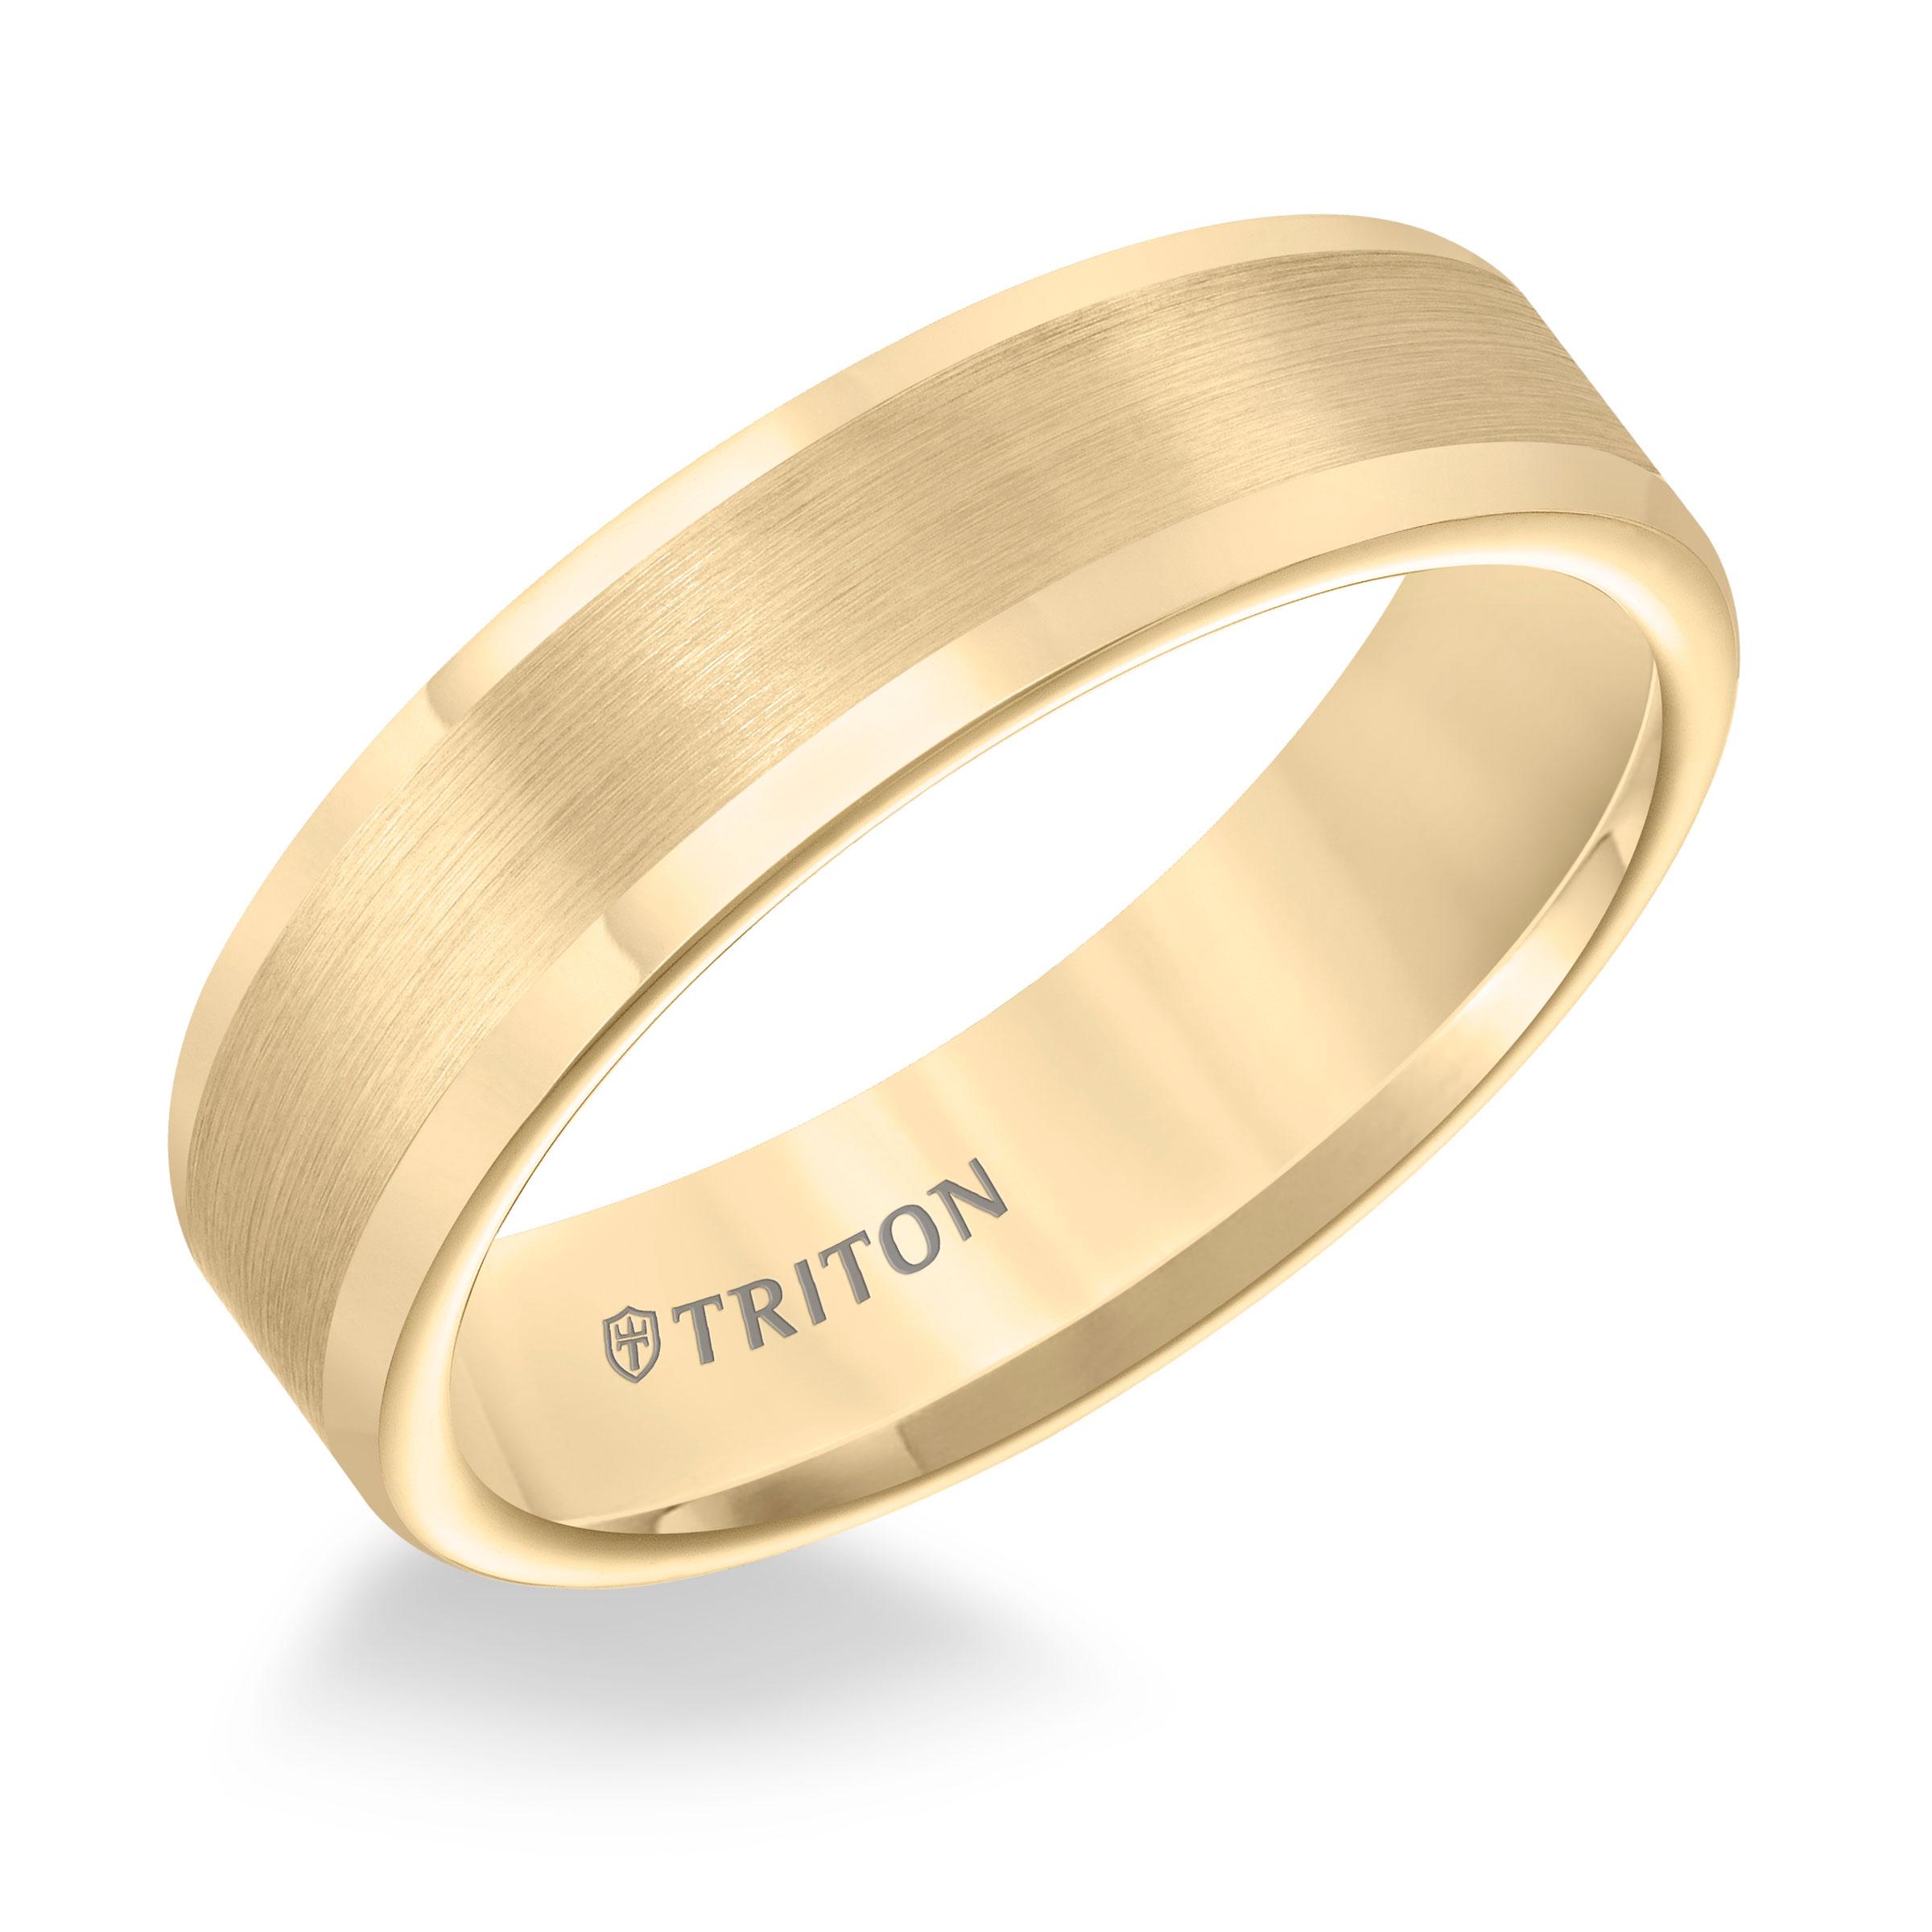 Triton 11 2117yc g0 long island ny triton mens for Long island wedding bands